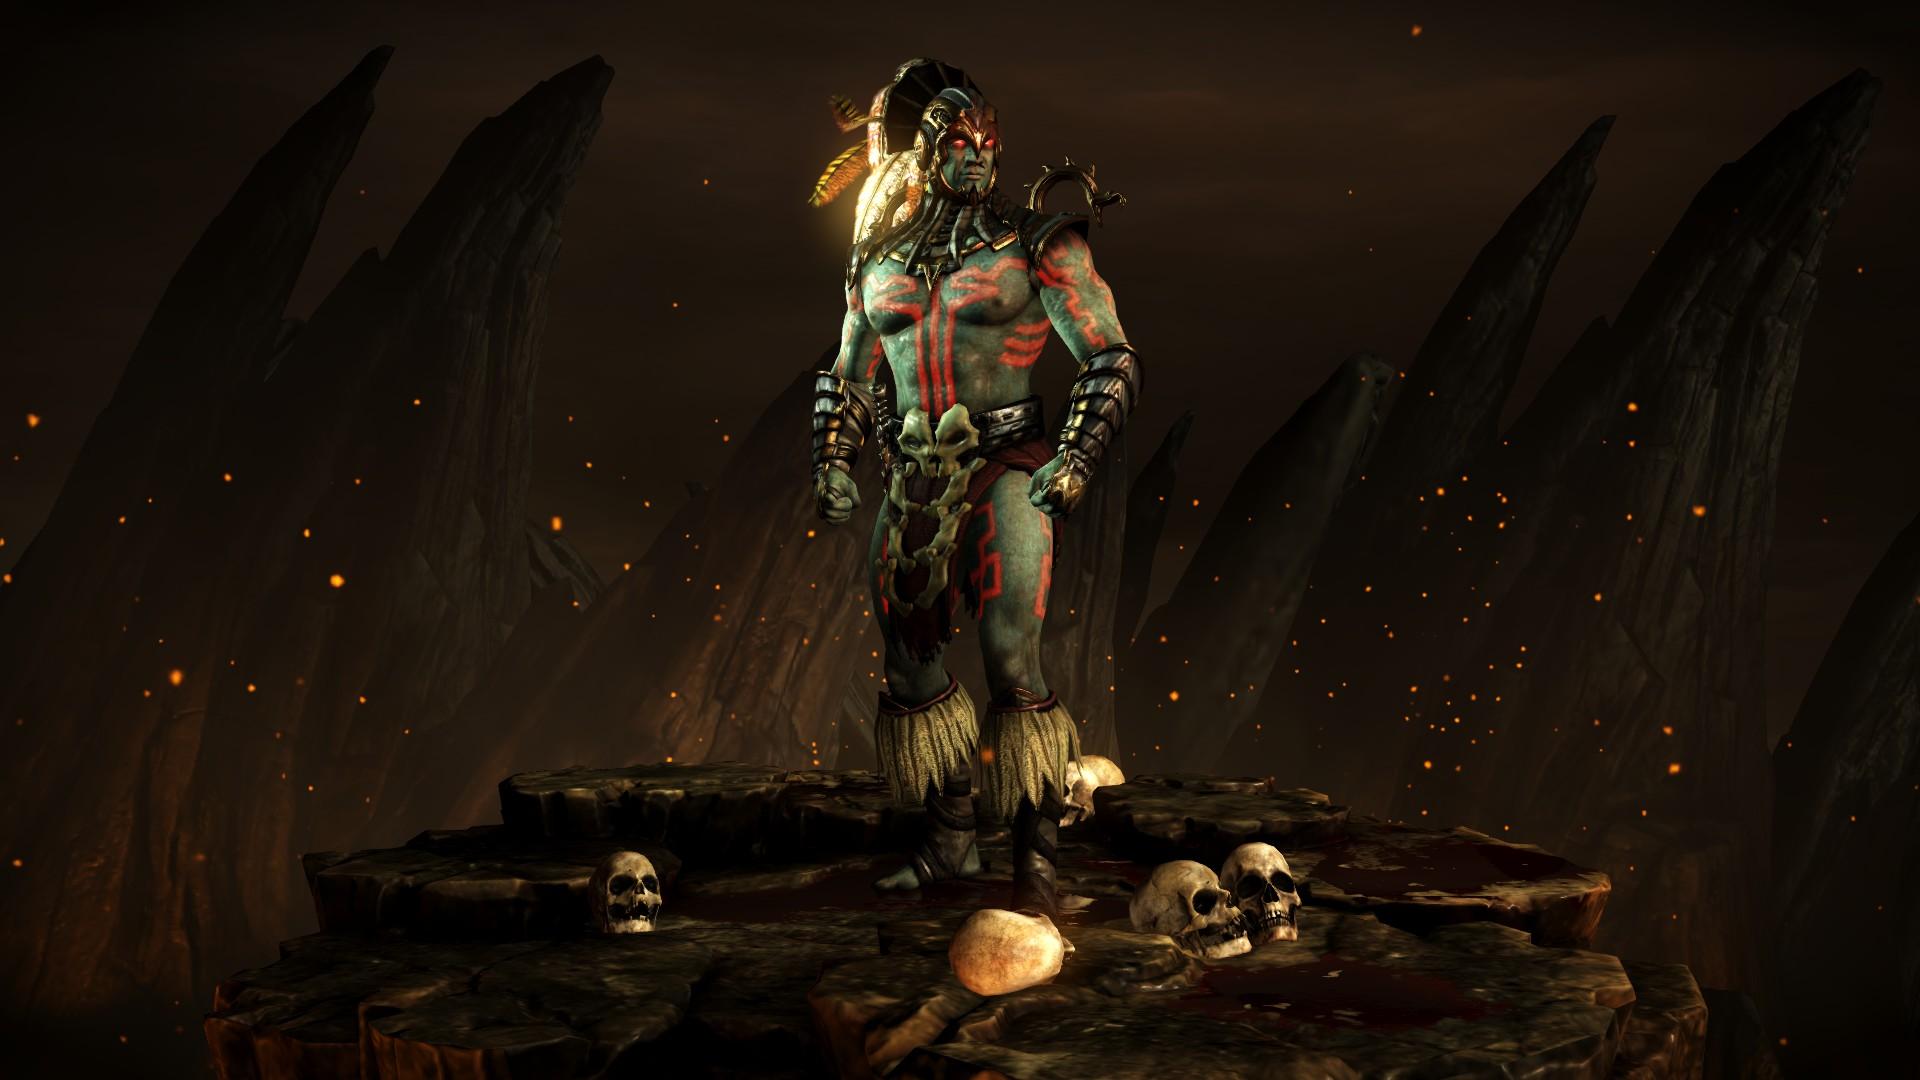 Коталь Кан (Стиль: Бог крови) - Mortal Kombat X Коталь Кан